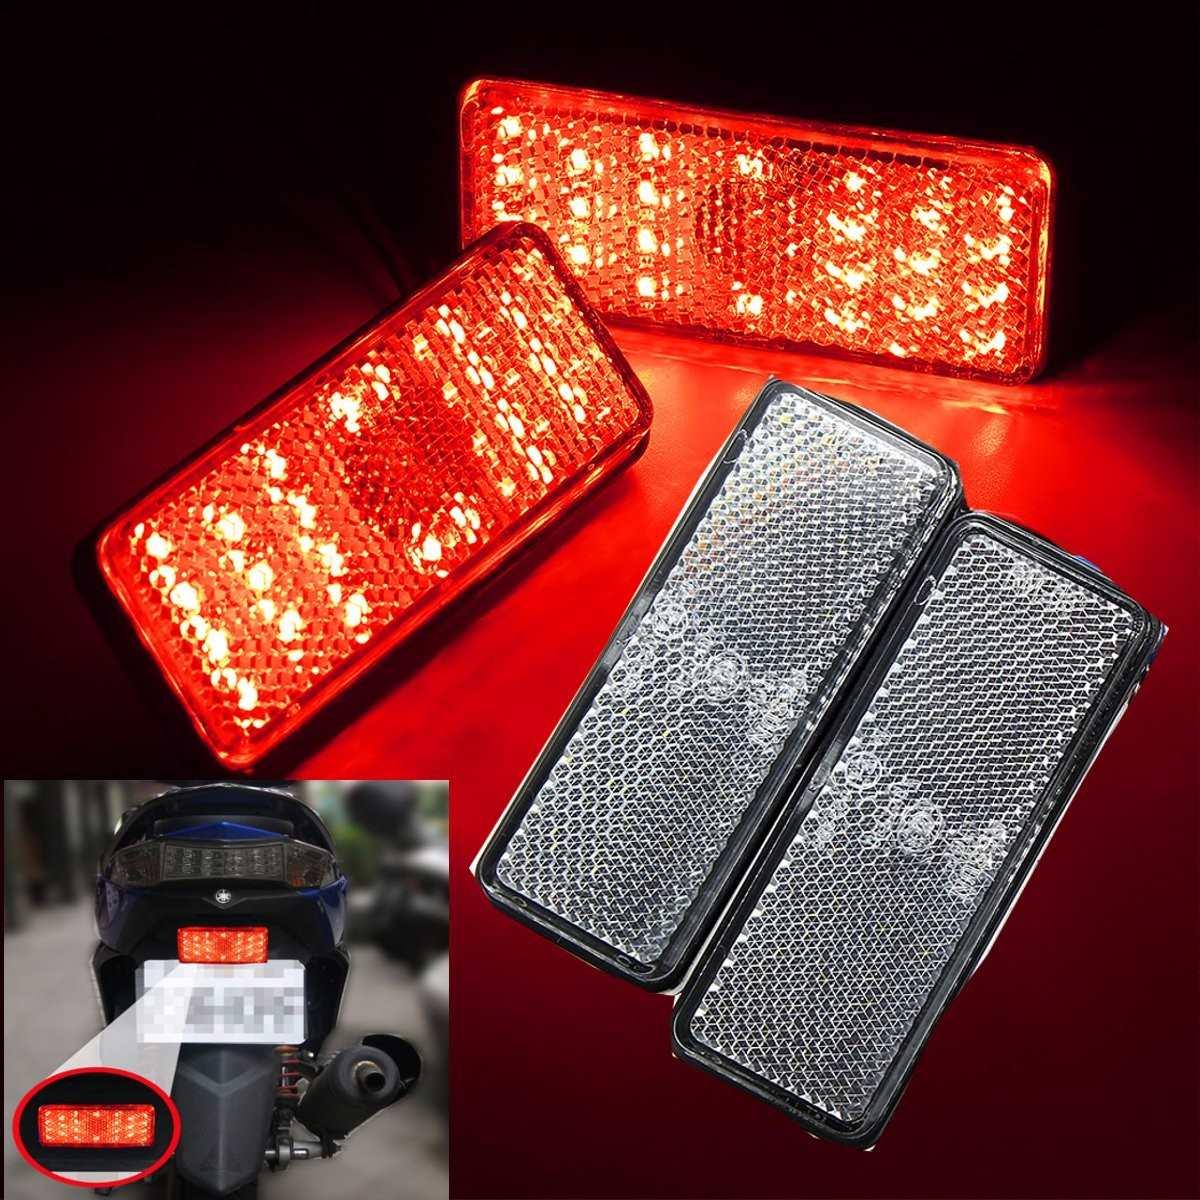 2x Rectangle Reflector LED Yellow Tail Brake Stop Light Universal Car Auto Truck